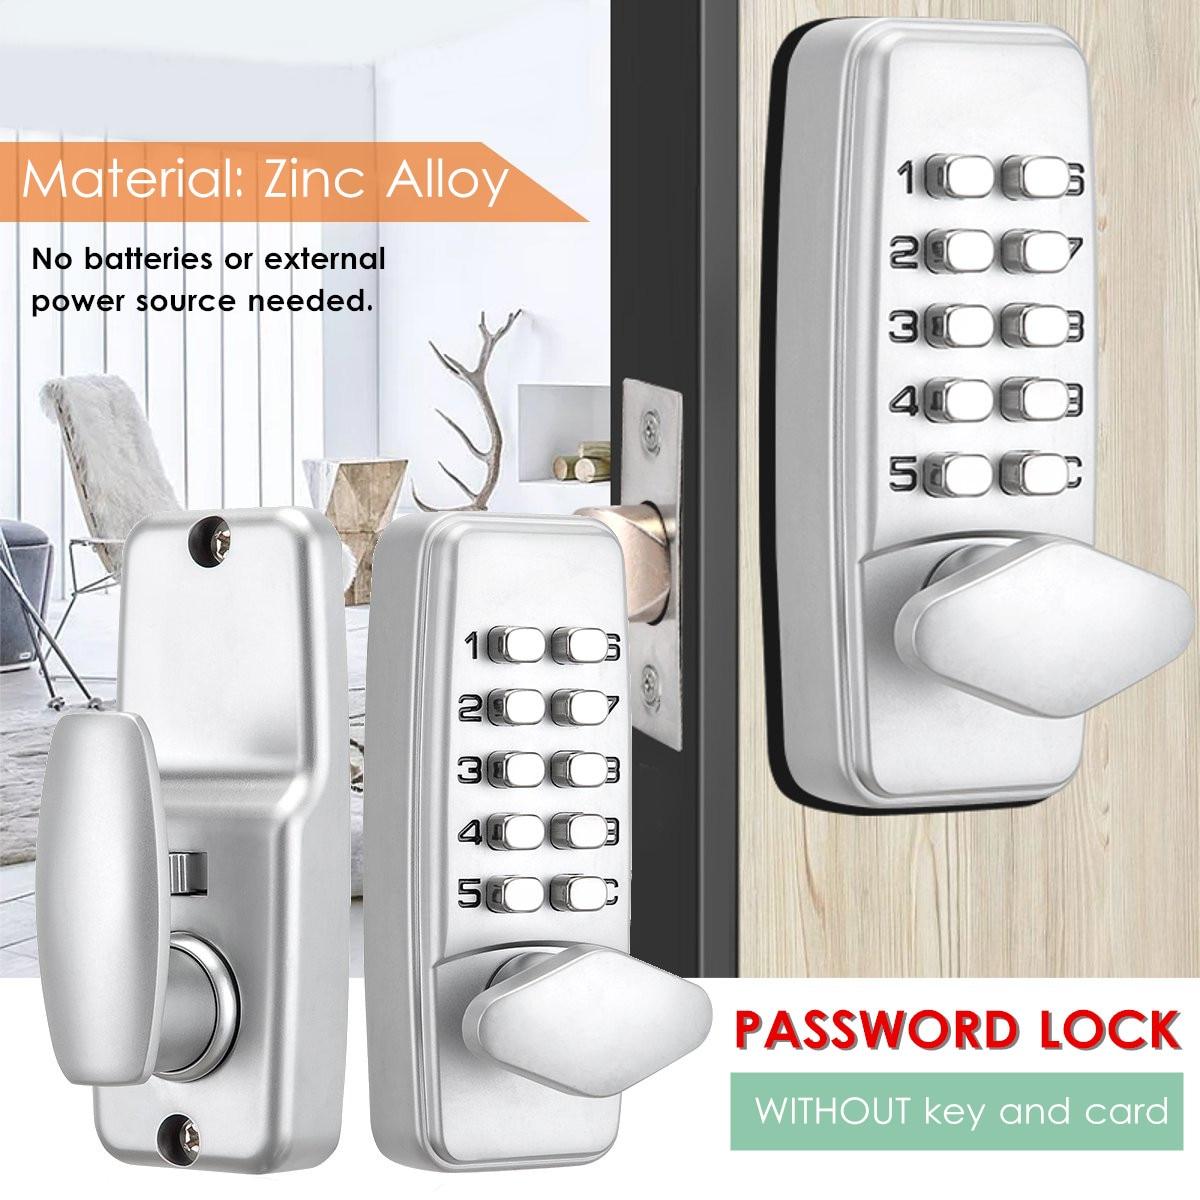 Serratura meccanica Keyless Password di Sicurezza di Blocco di Codice Digitale di Ingresso Esterno Meccanismo di Blocco di Controllo di Accesso Set di AccessoriSerratura meccanica Keyless Password di Sicurezza di Blocco di Codice Digitale di Ingresso Esterno Meccanismo di Blocco di Controllo di Accesso Set di Accessori